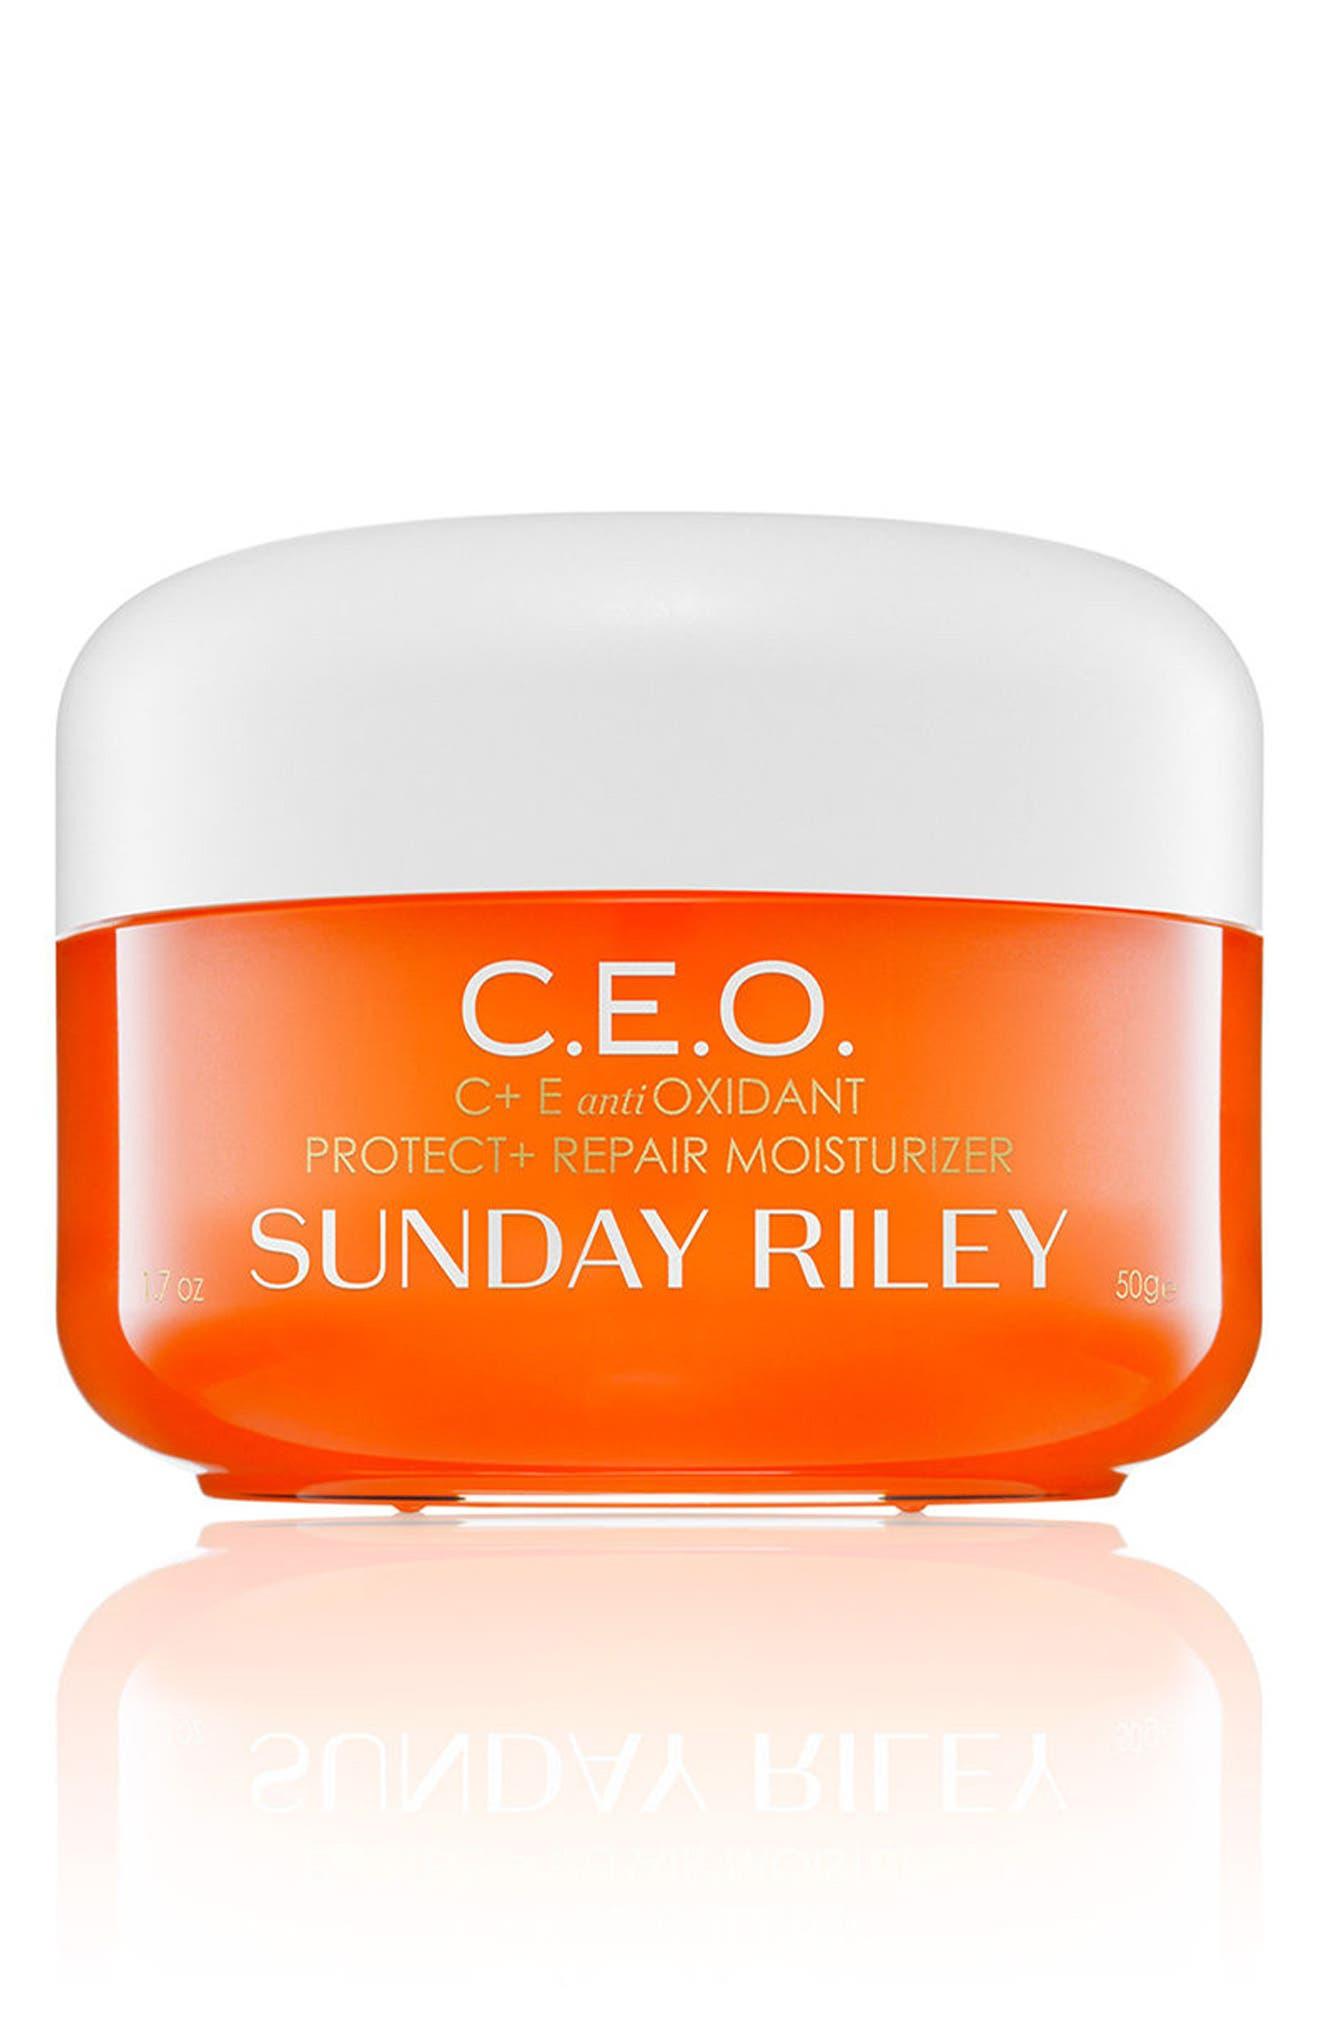 SPACE.NK.apothecary Sunday Riley C.E.O. C + E Antioxidant Protect & Repair Moisturizer